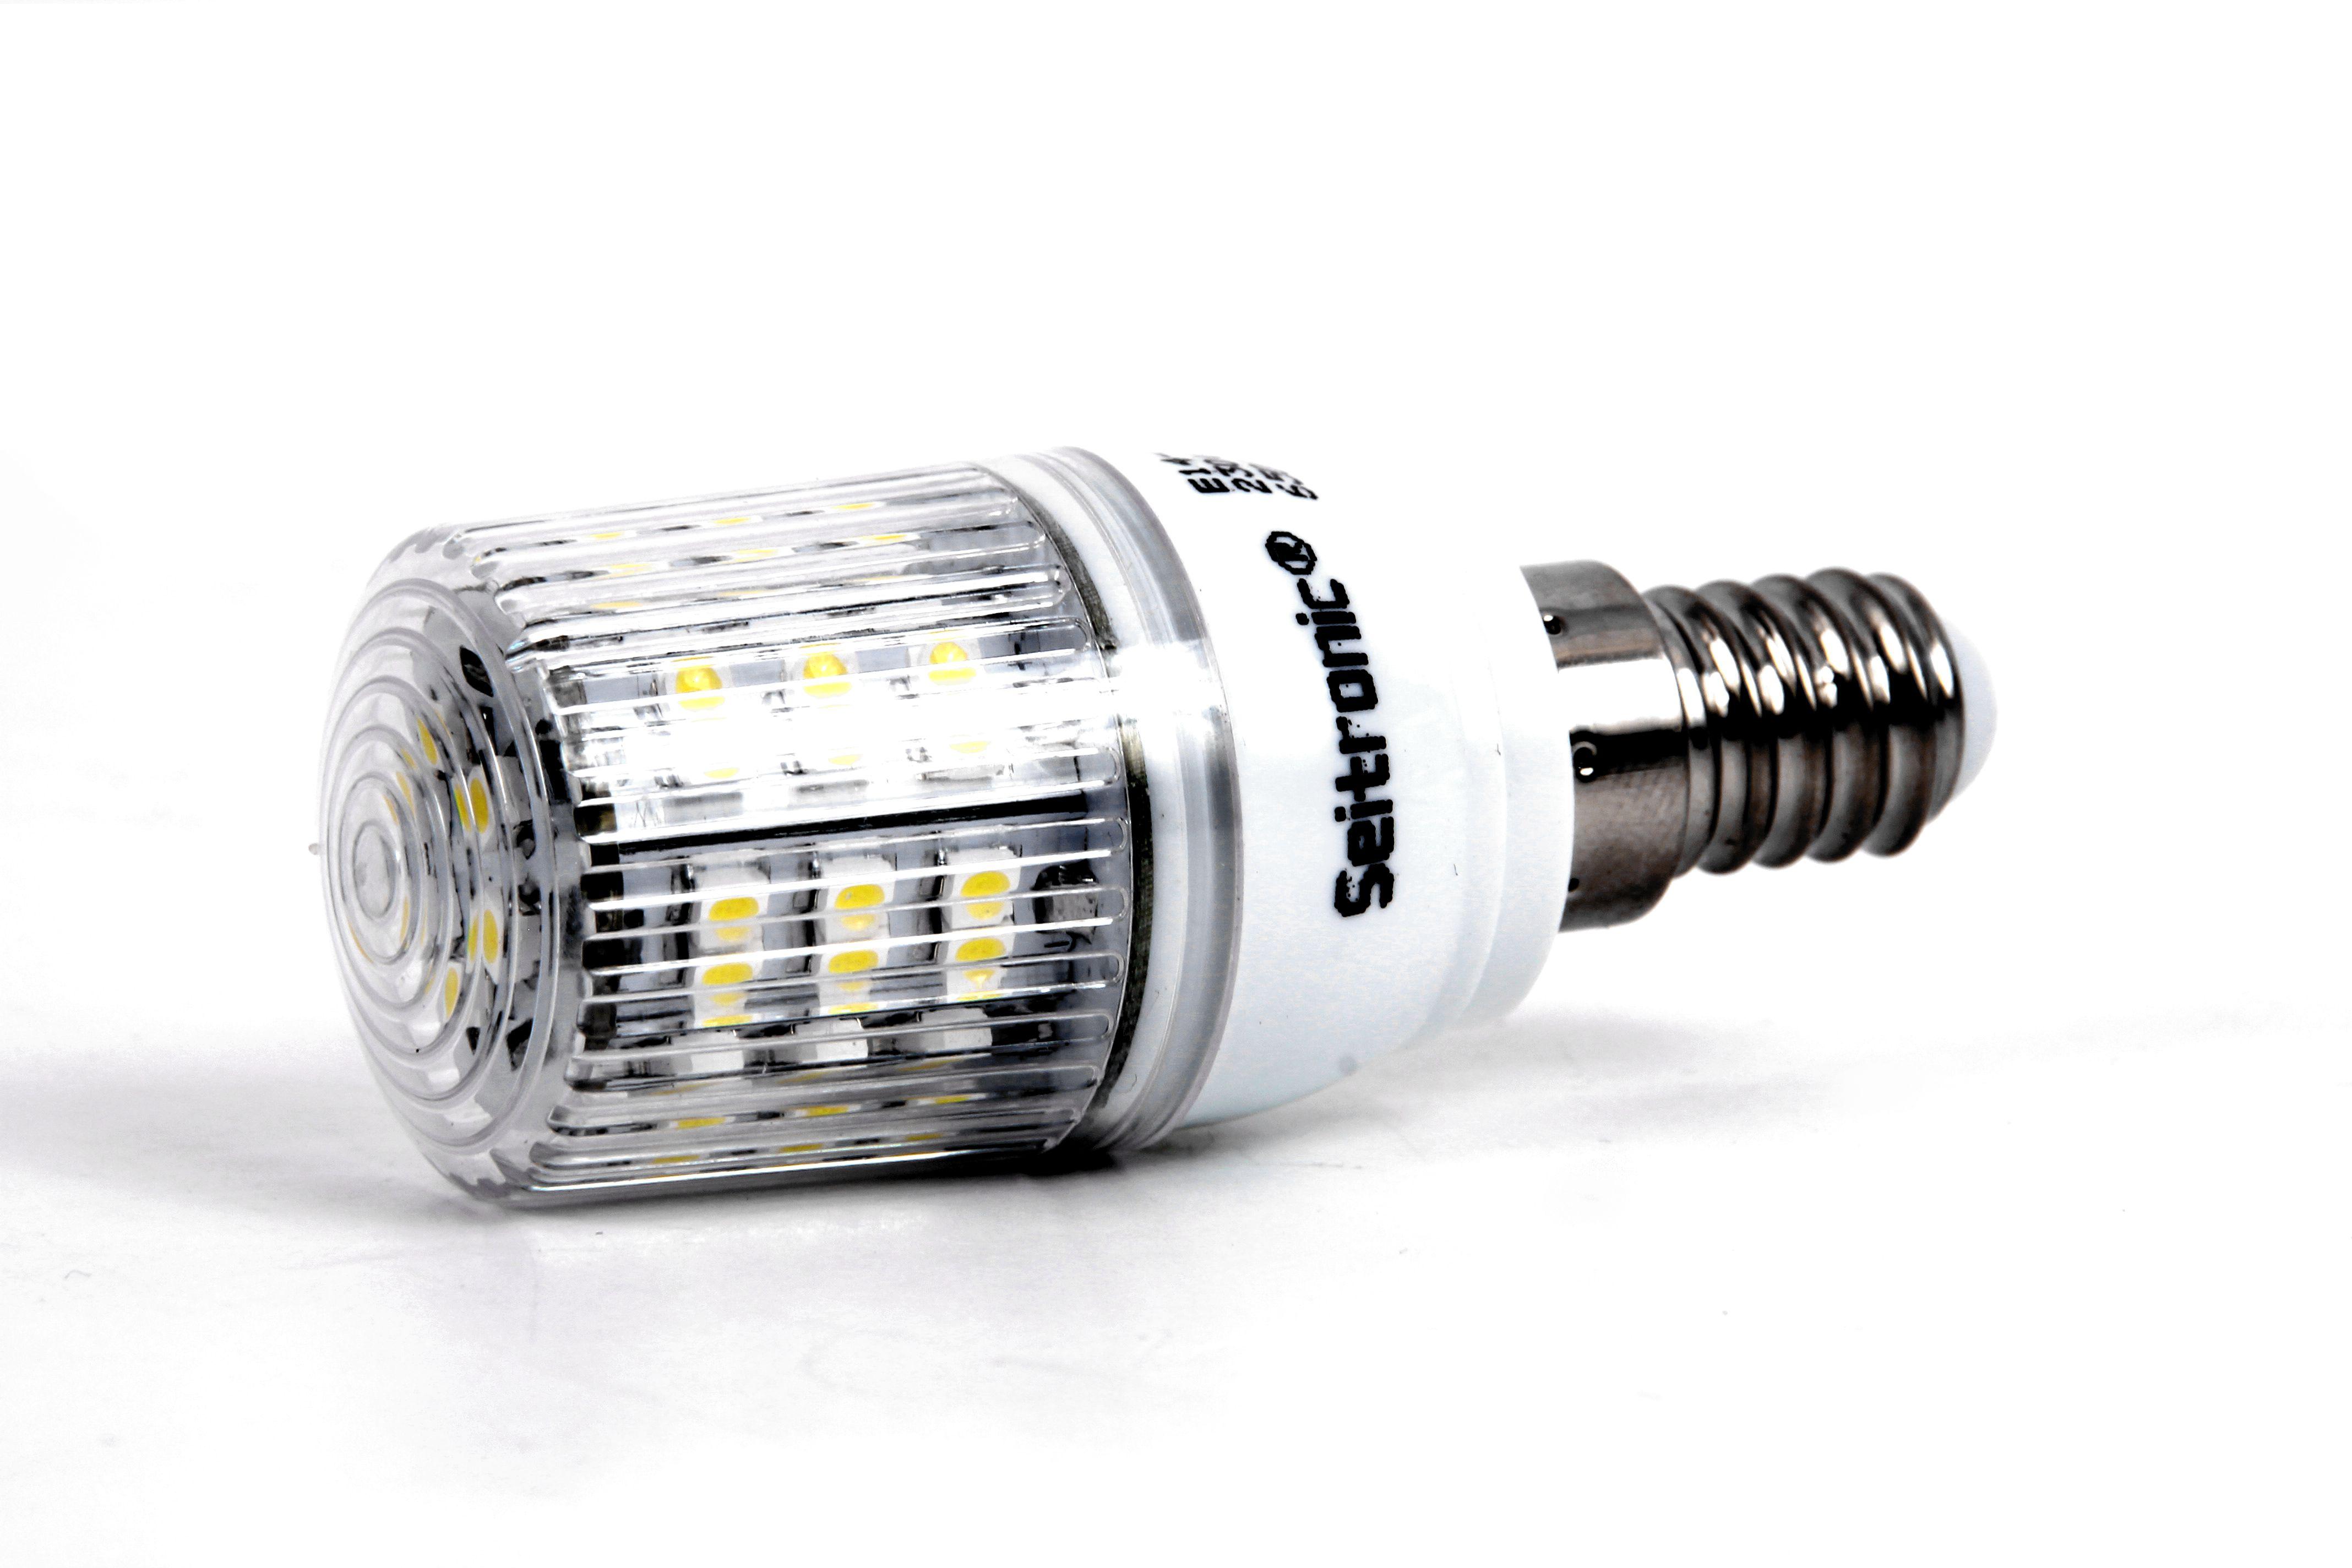 e14_led_leuchtmittel_seitronic_-_3_watt_260lm_6500k_48_leds_kalt-weiss_4968_1 Luxus Led Lampe 3 Watt Dekorationen